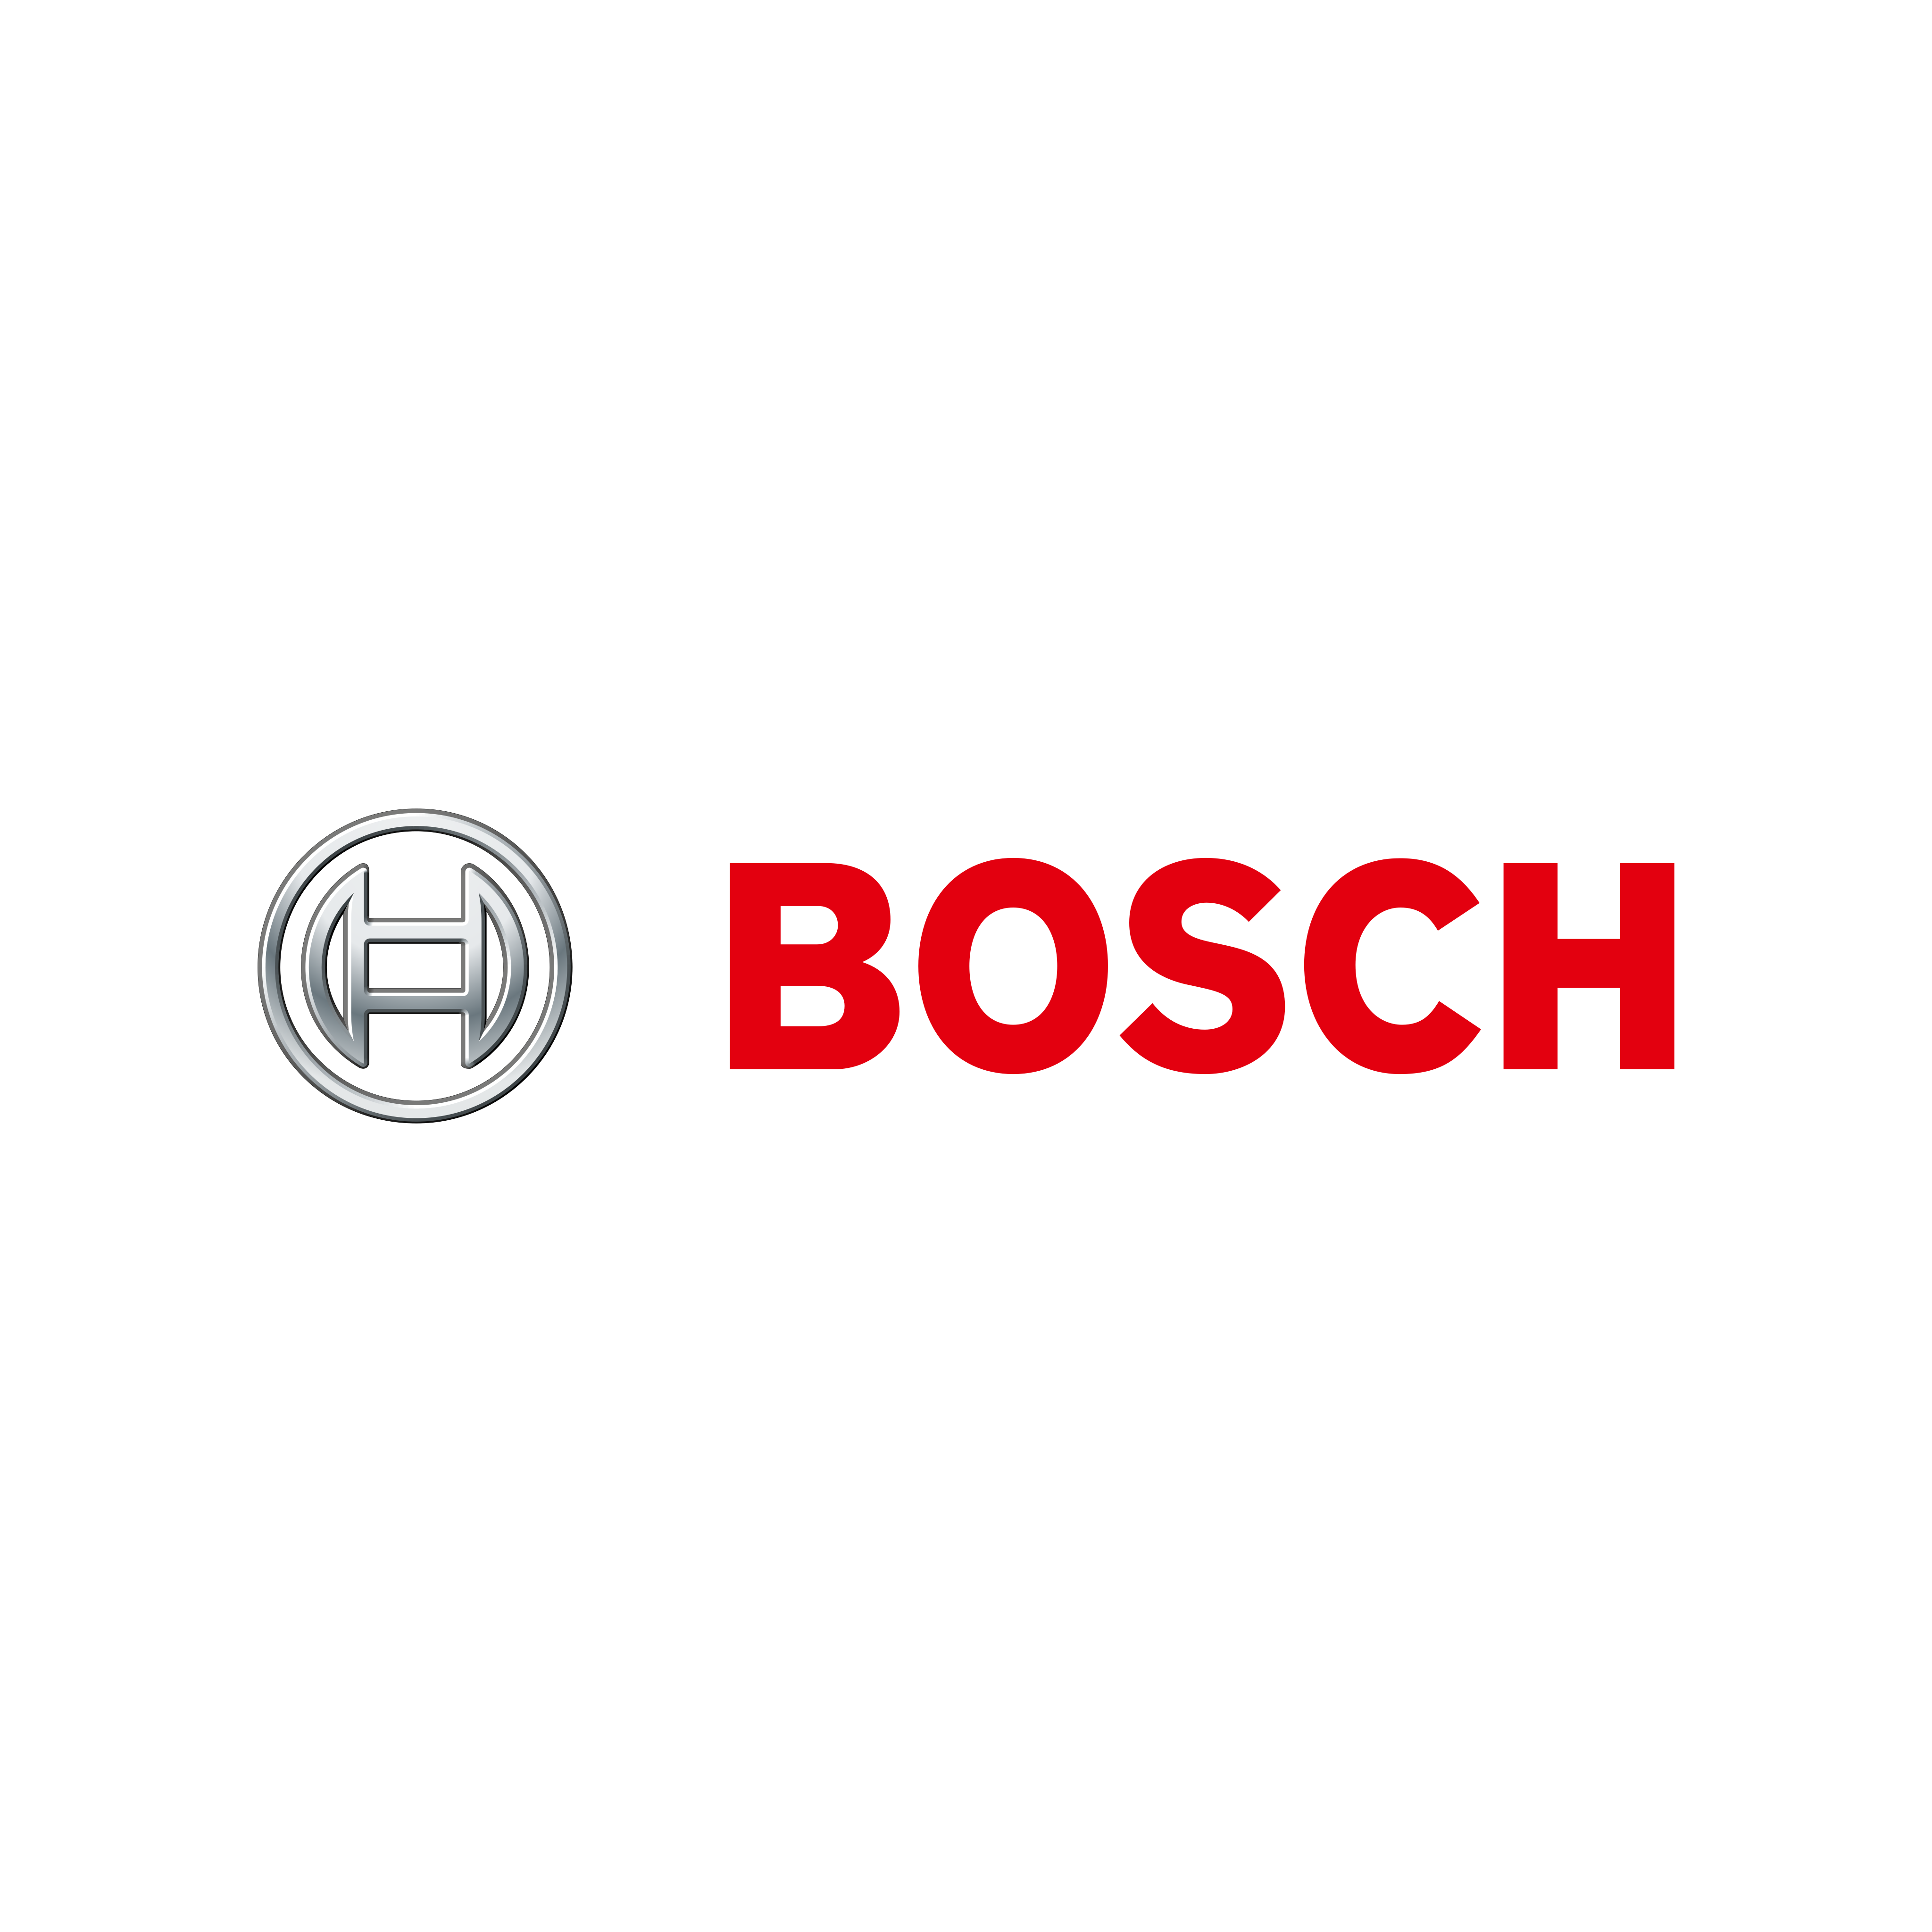 bosch logo 0 - Bosch Logo